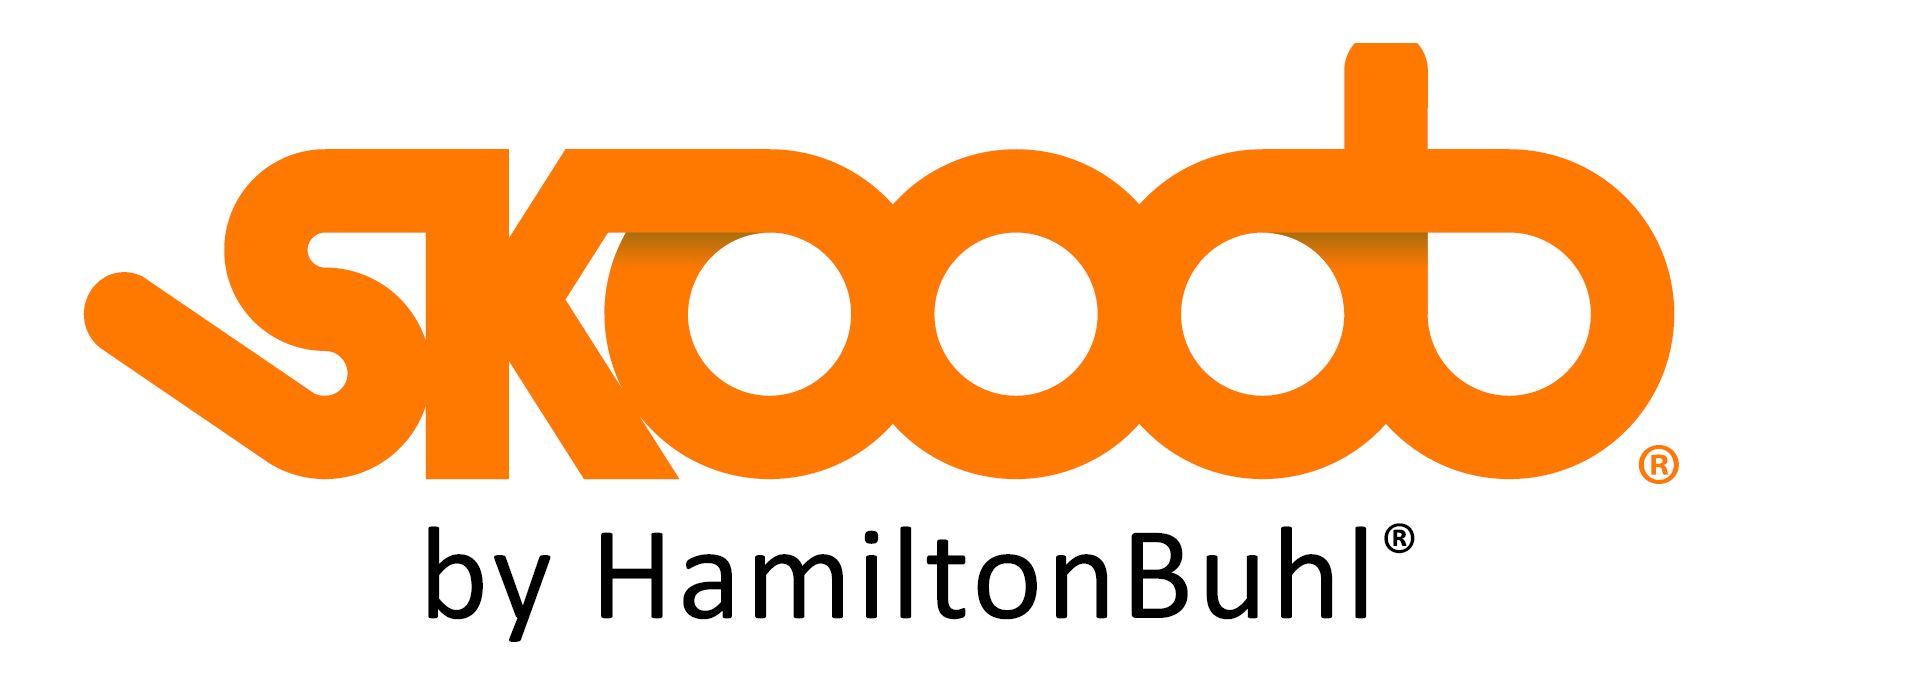 skooob-logo.jpg